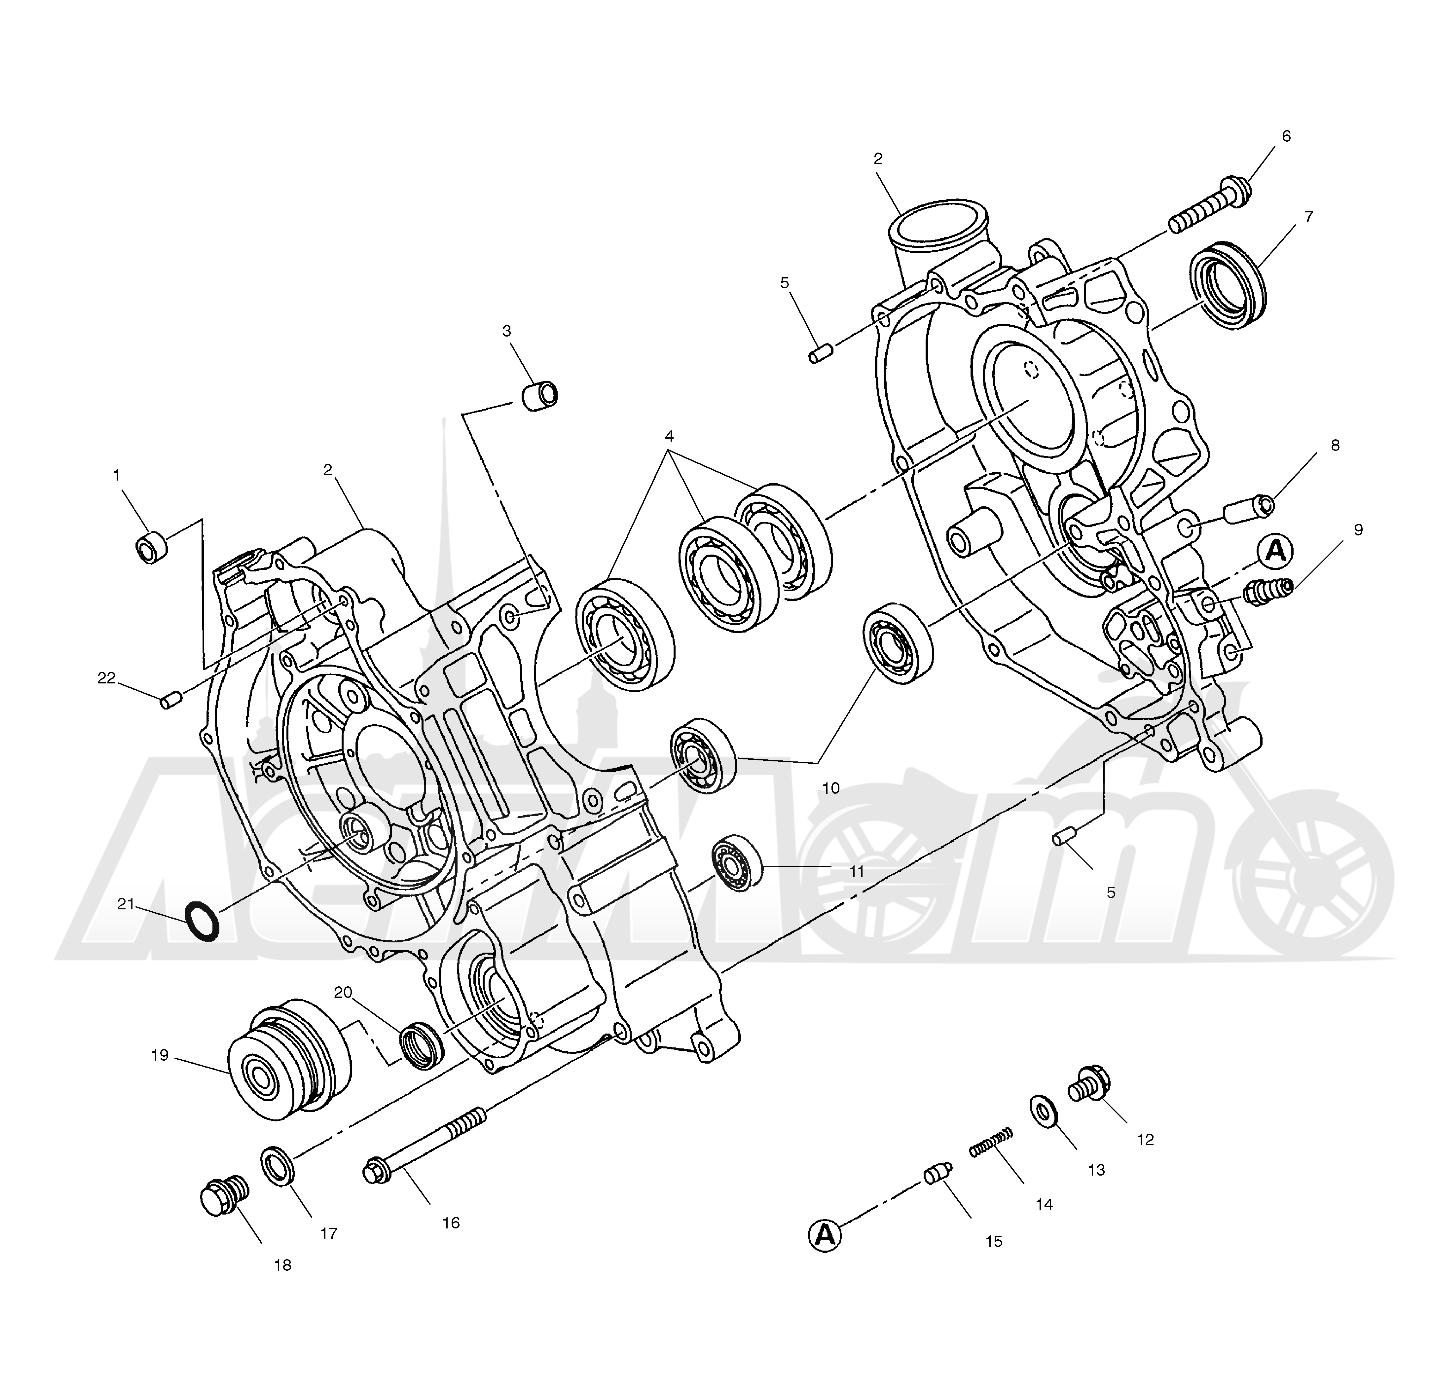 Запчасти для Квадроцикла Polaris 1997 SWEDISH SPORTSMAN 50 - S97CH50E Раздел: CRANKCASE - W97CH50A | картер W97CH50A